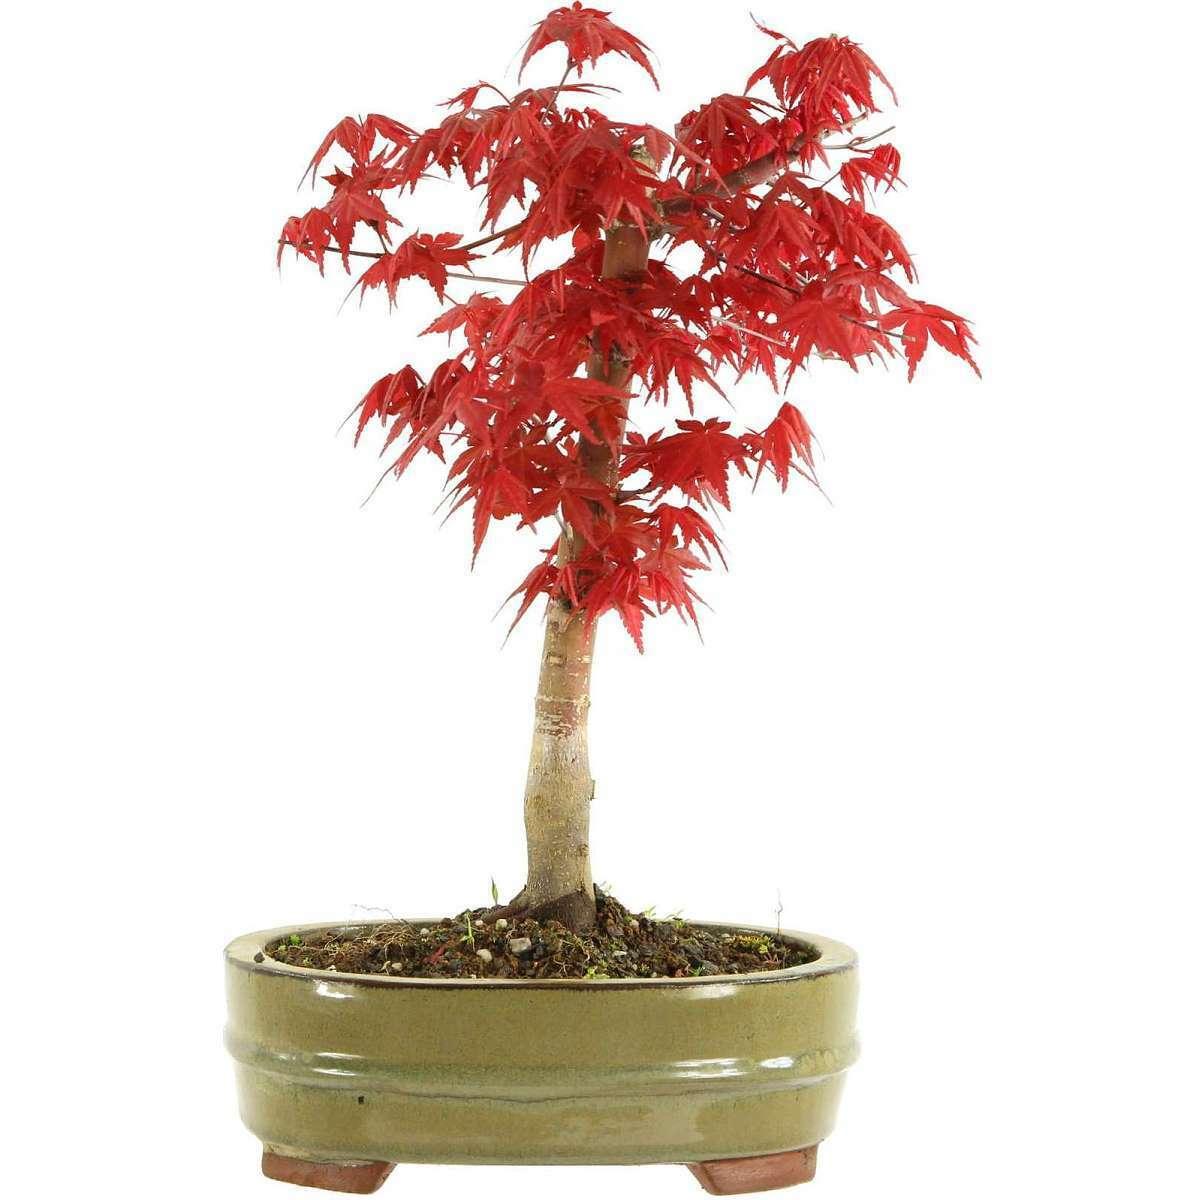 Acero palmato Deshojo, Bonsai, 10 anni, 35cm (111-26)